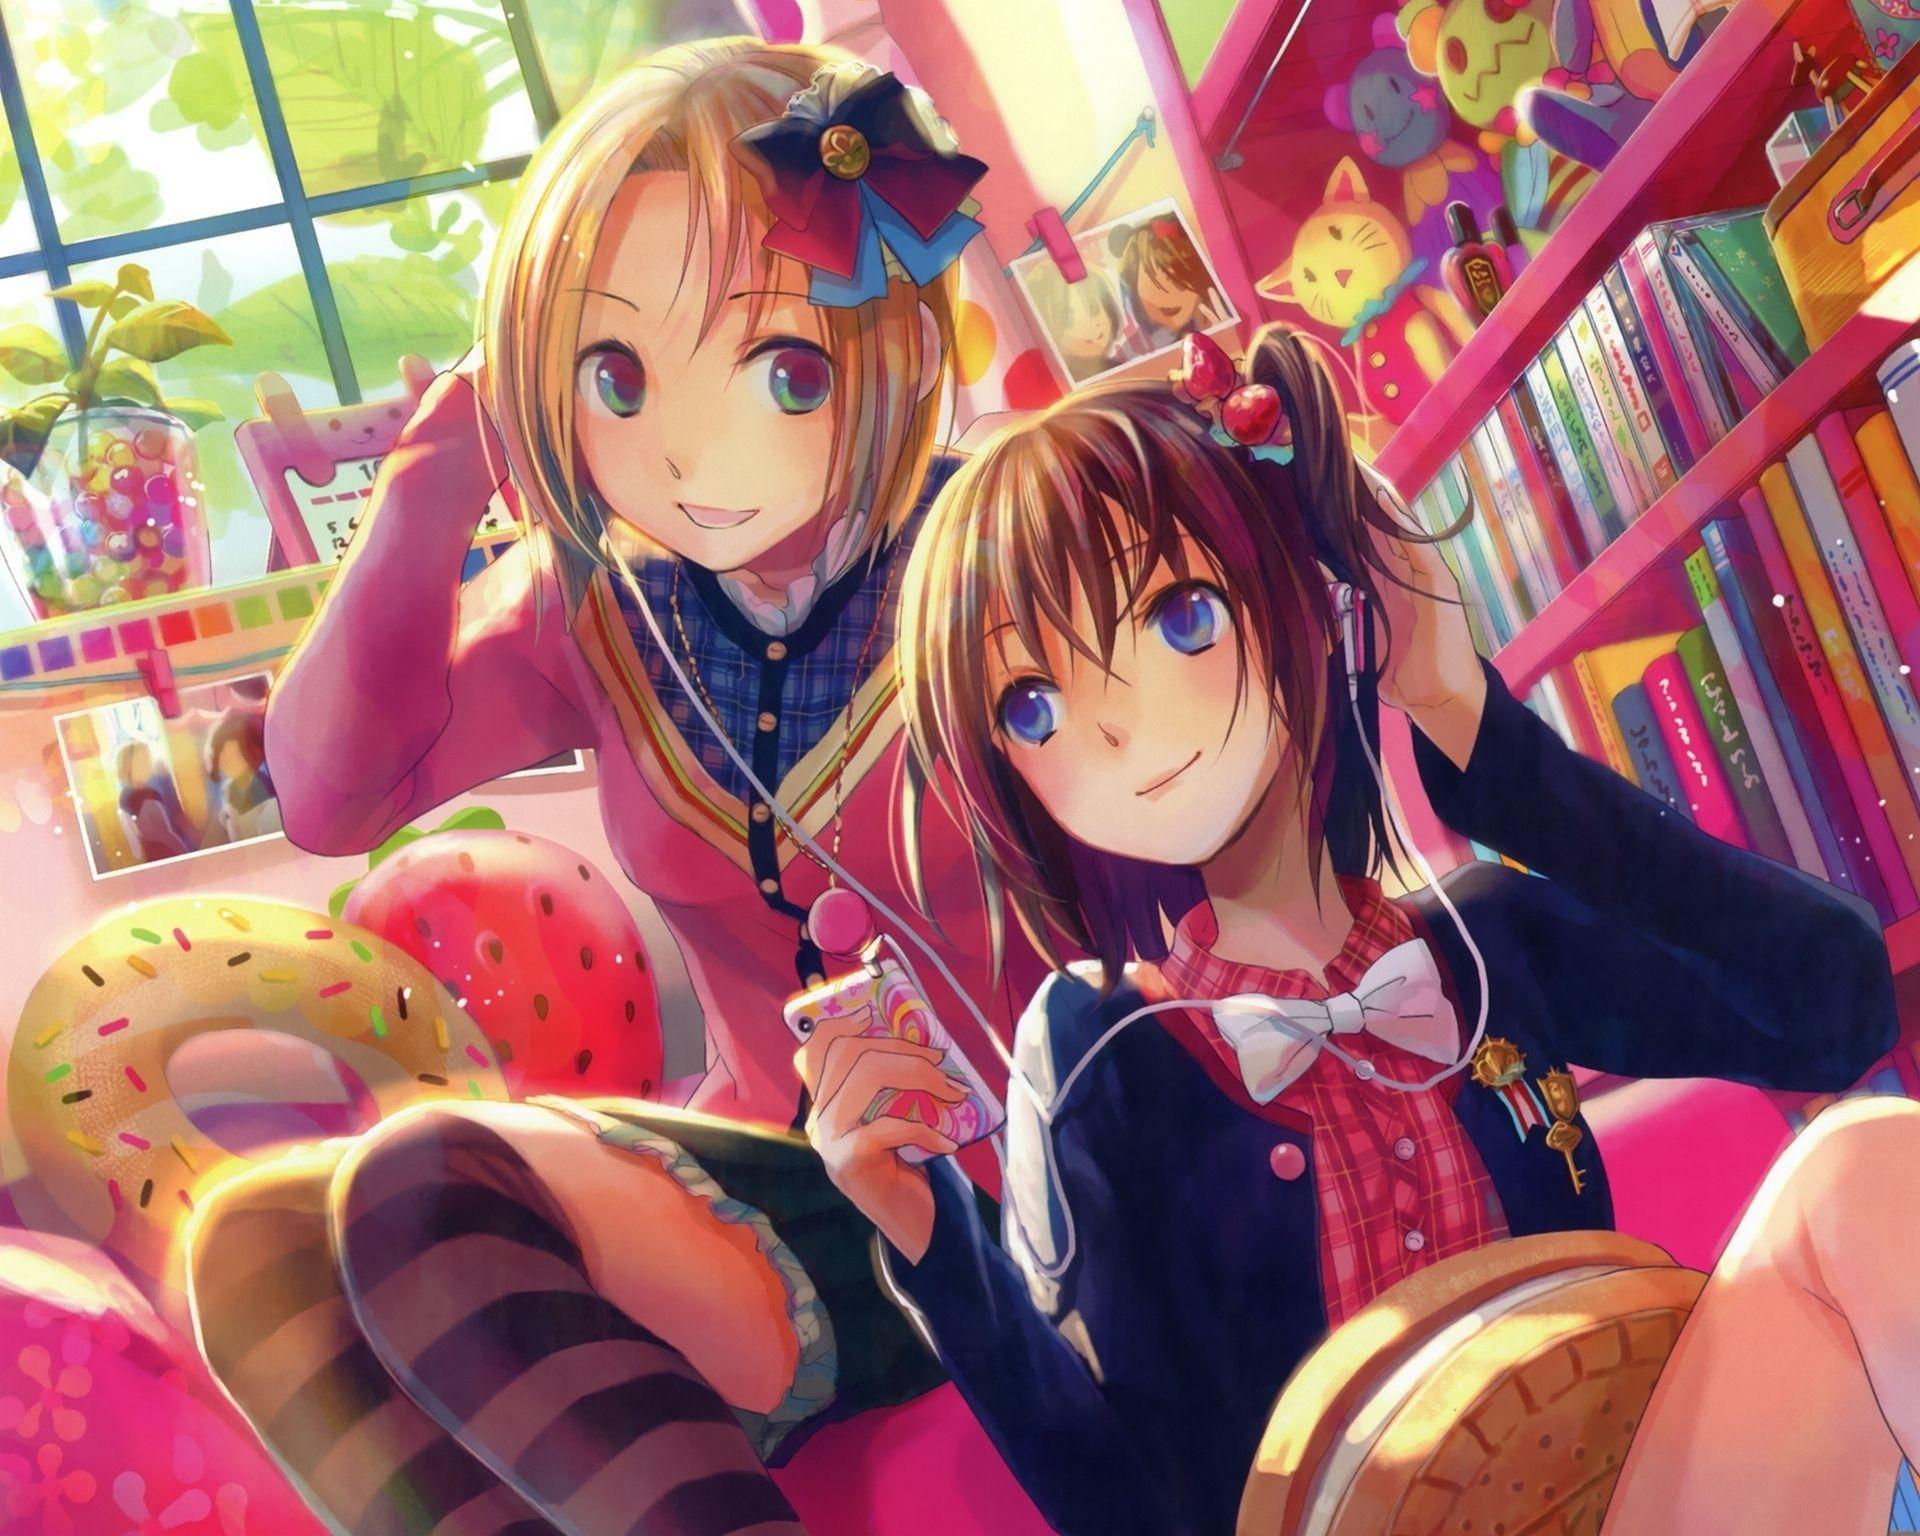 Japanese Anime Friends Desktop Wallpapers Top Free Japanese Anime Friends Desktop Backgrounds Wallpaperaccess